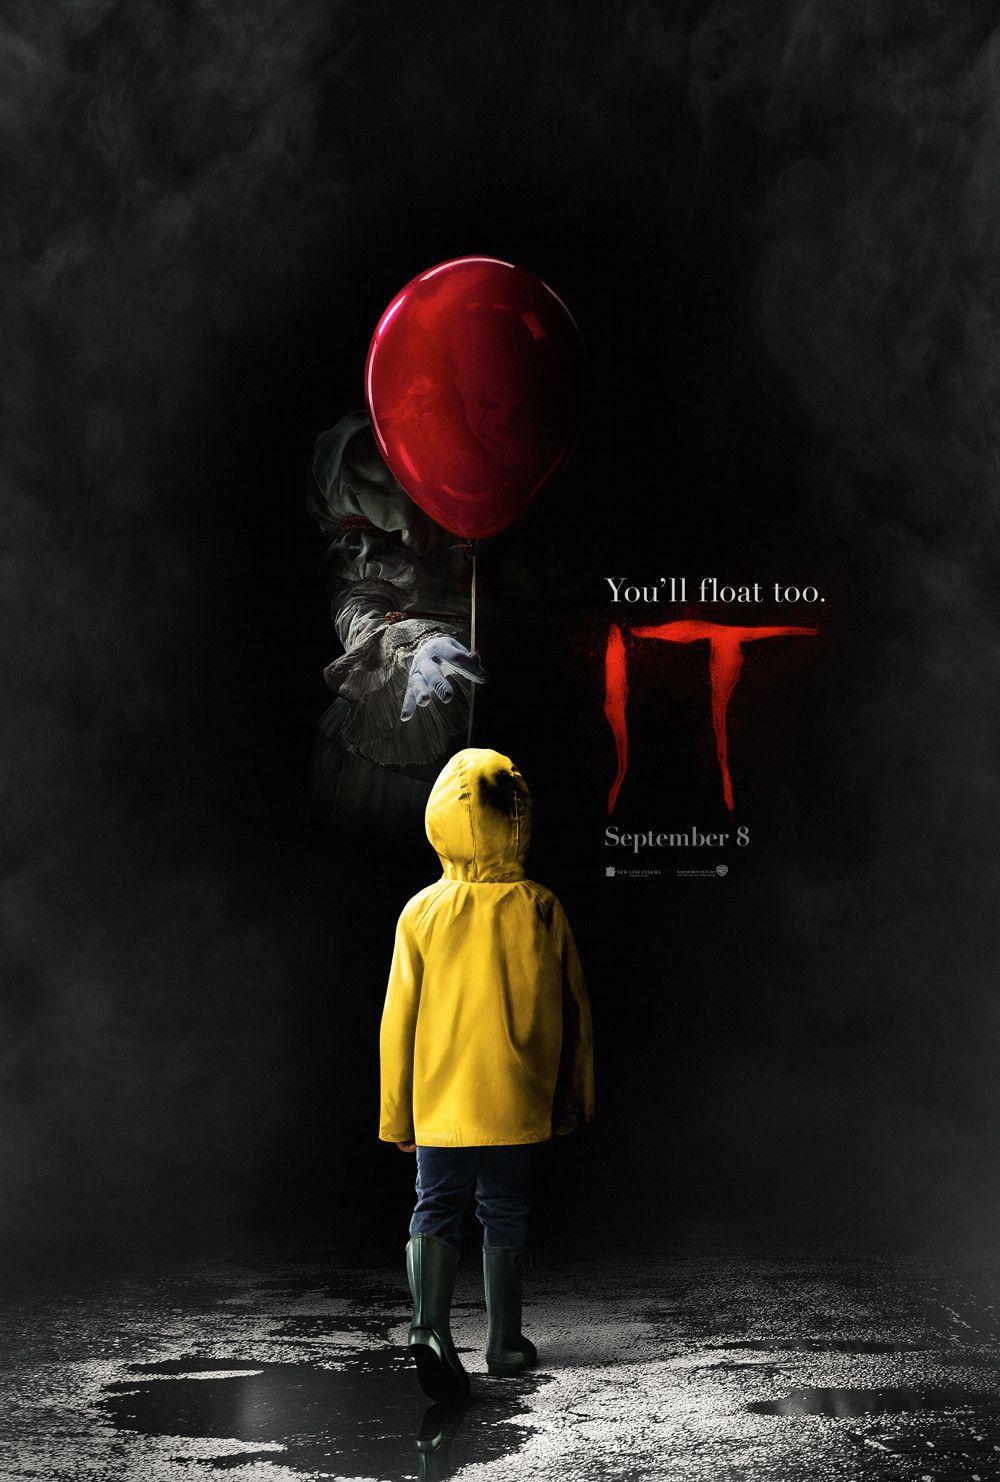 It A Coisa It Dir Andy Muschietti 2017 Cartazes De Filmes De Terror Filmes De Terror Filmes